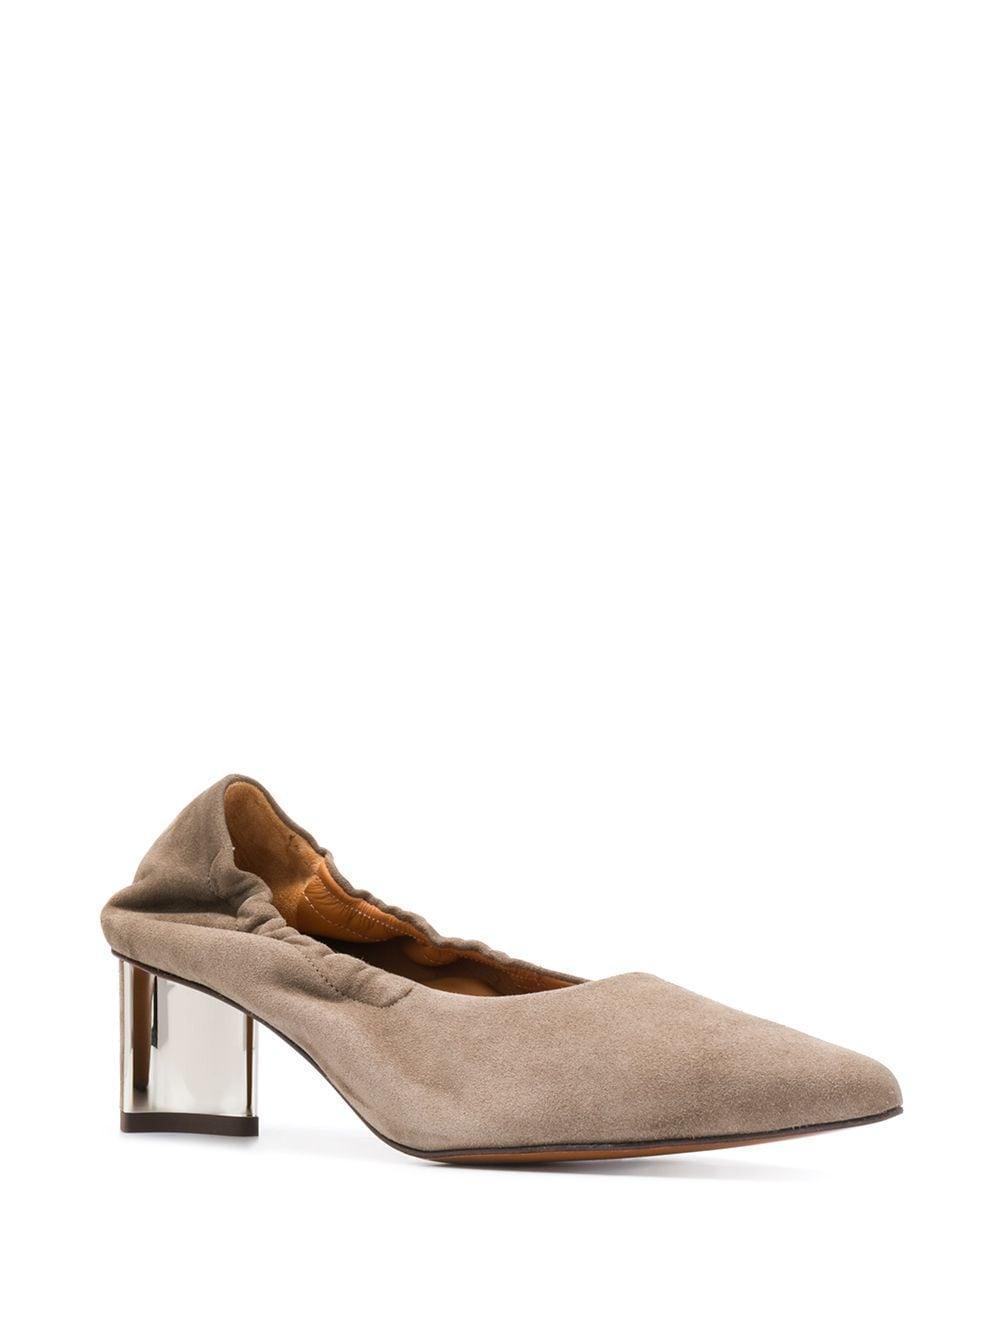 Zapatos de tacón Solal2 de 45mm Robert Clergerie de Ante de color Gris